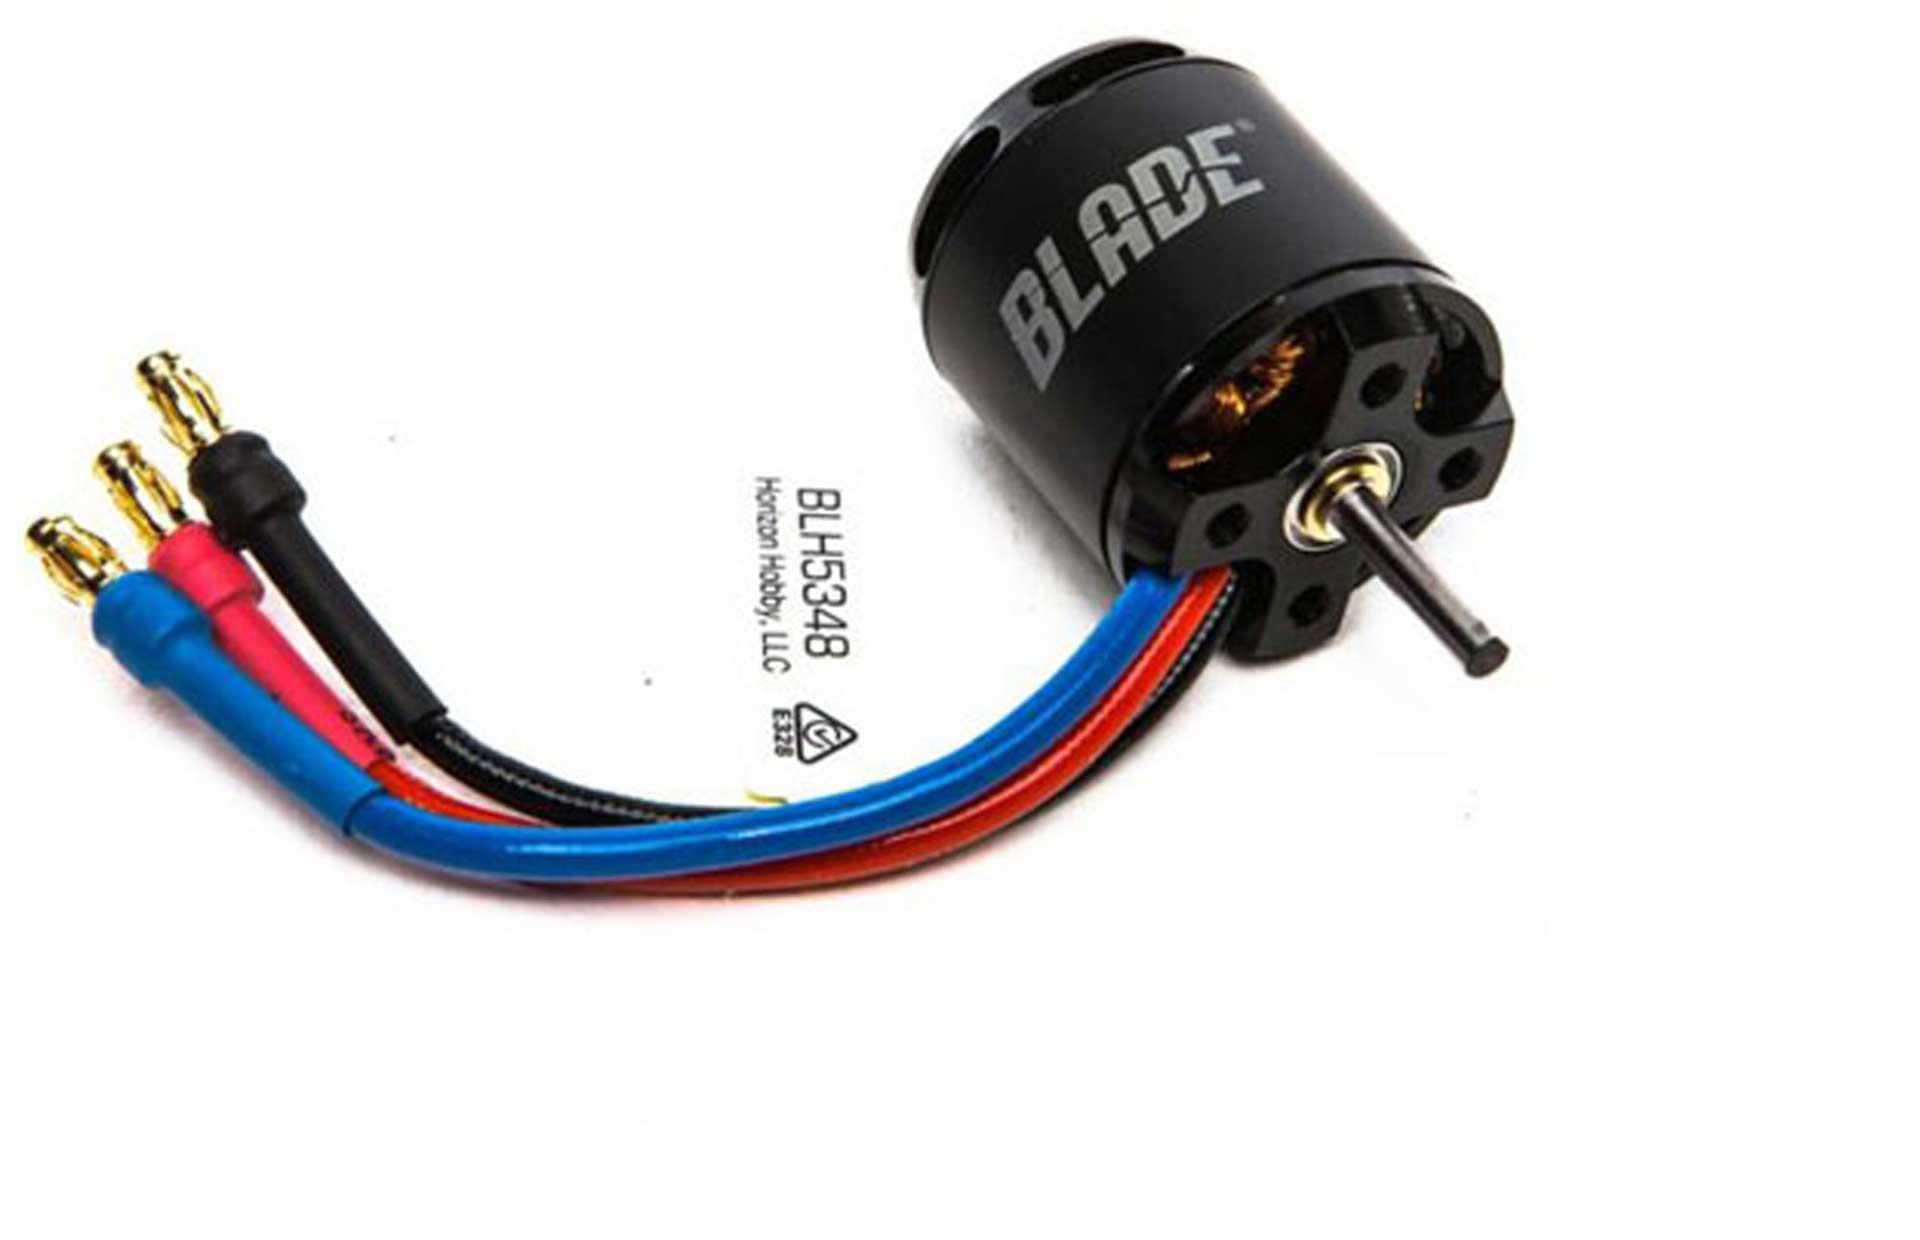 BLADE (E-FLITE) BL MOTOR 2950KV FUSION 270